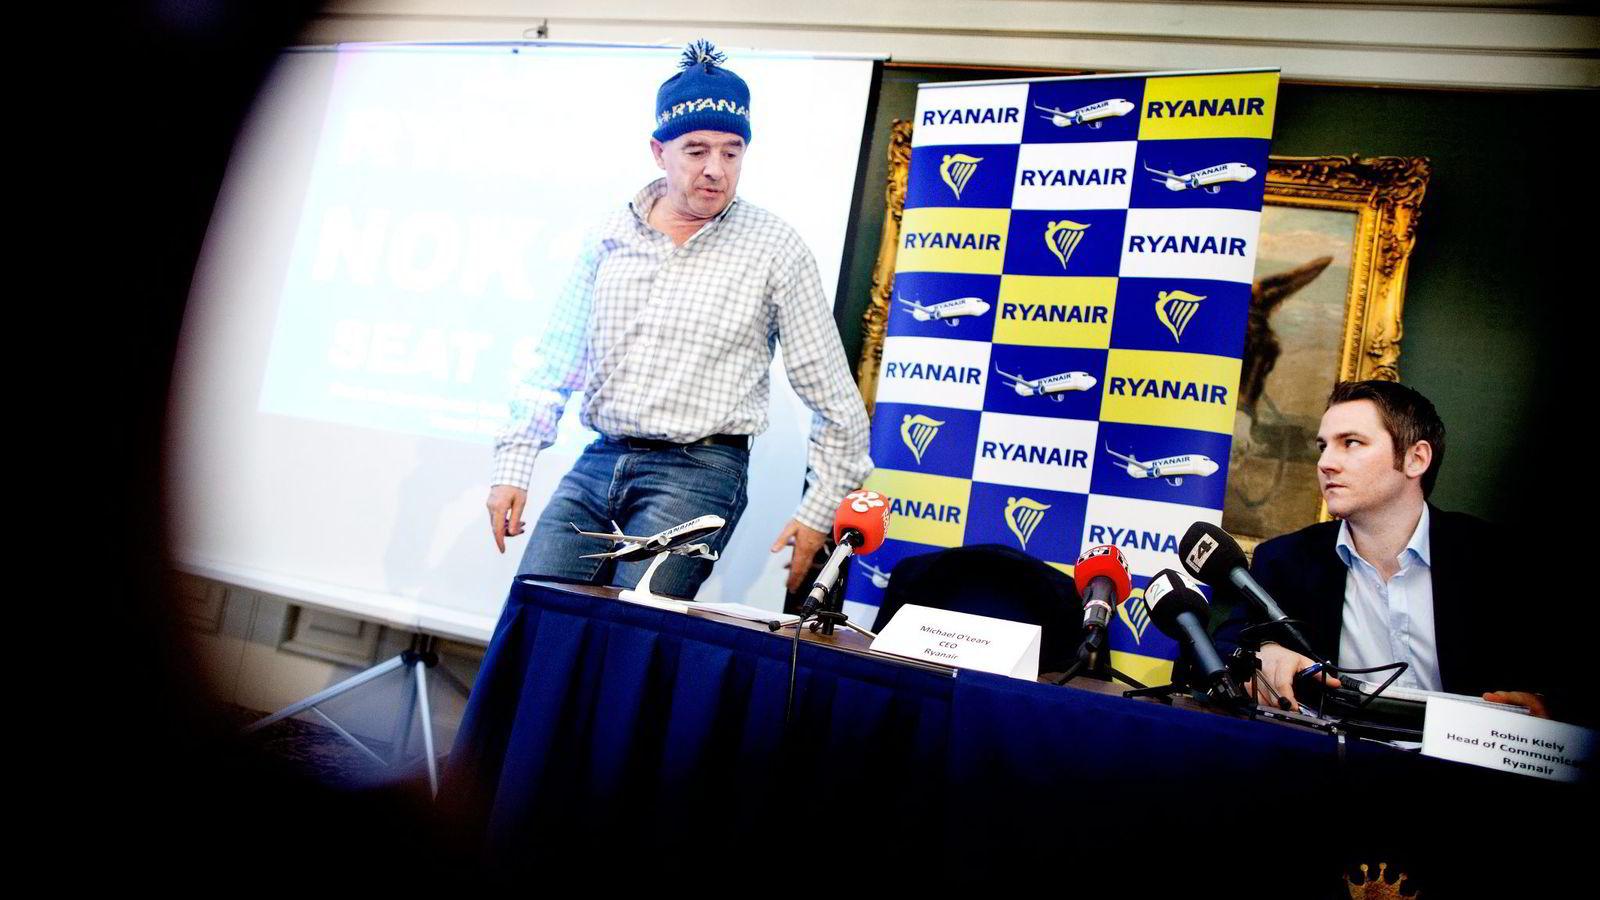 Ryanair-sjef Michael O'Leary (t.v.), her med kommunikasjonssjef Robin Kiely. Foto: Ida von Hanno Bast